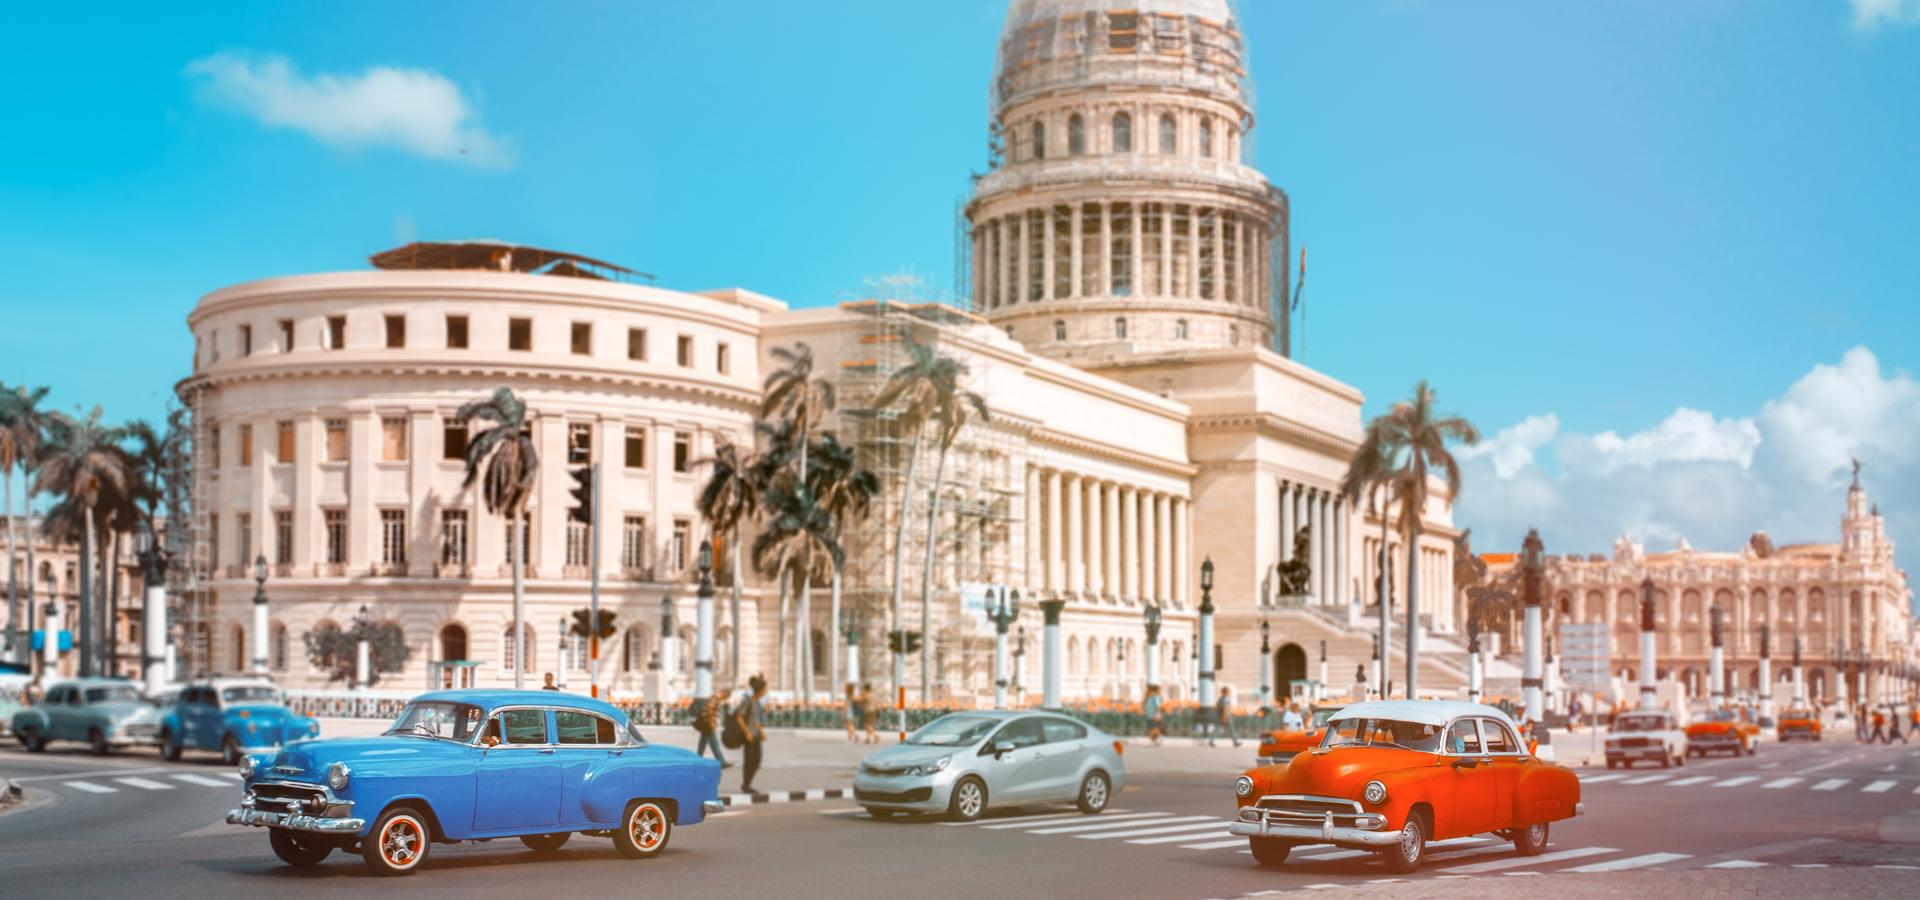 Peer-to-peer advisory in Havana, Ciudad de la  Habana, Cuba